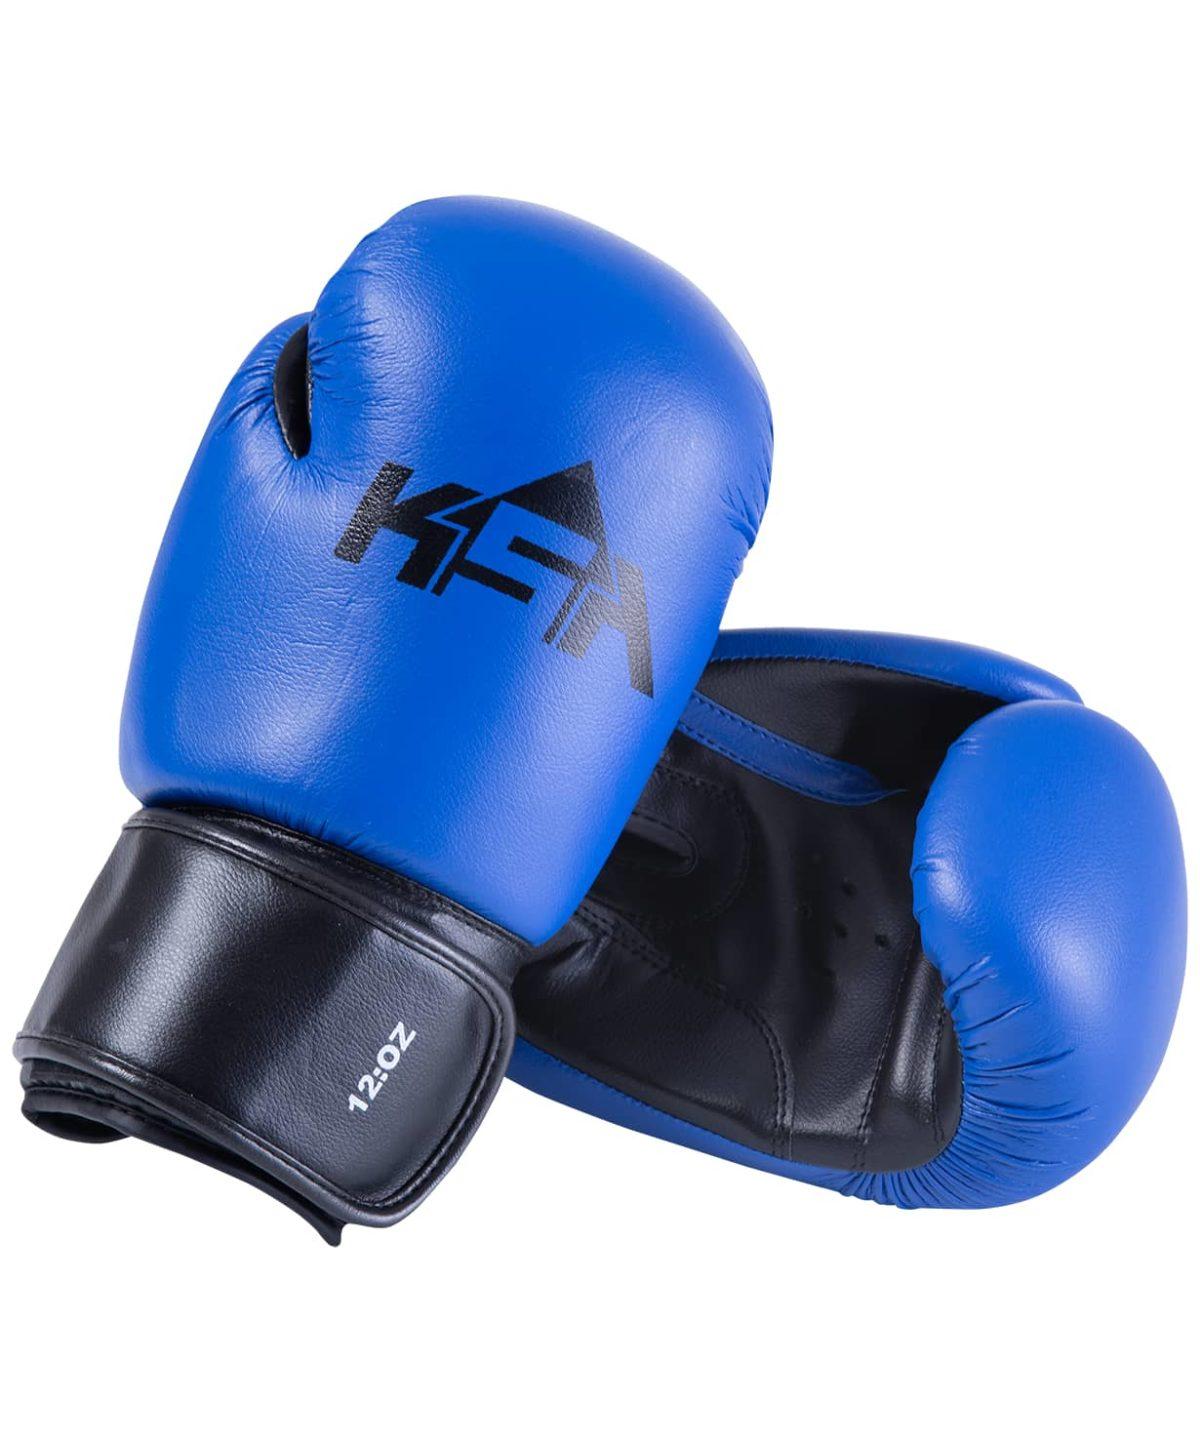 KSA Spider Blue Перчатки боксерские, 4 oz, к/з  17803 - 1